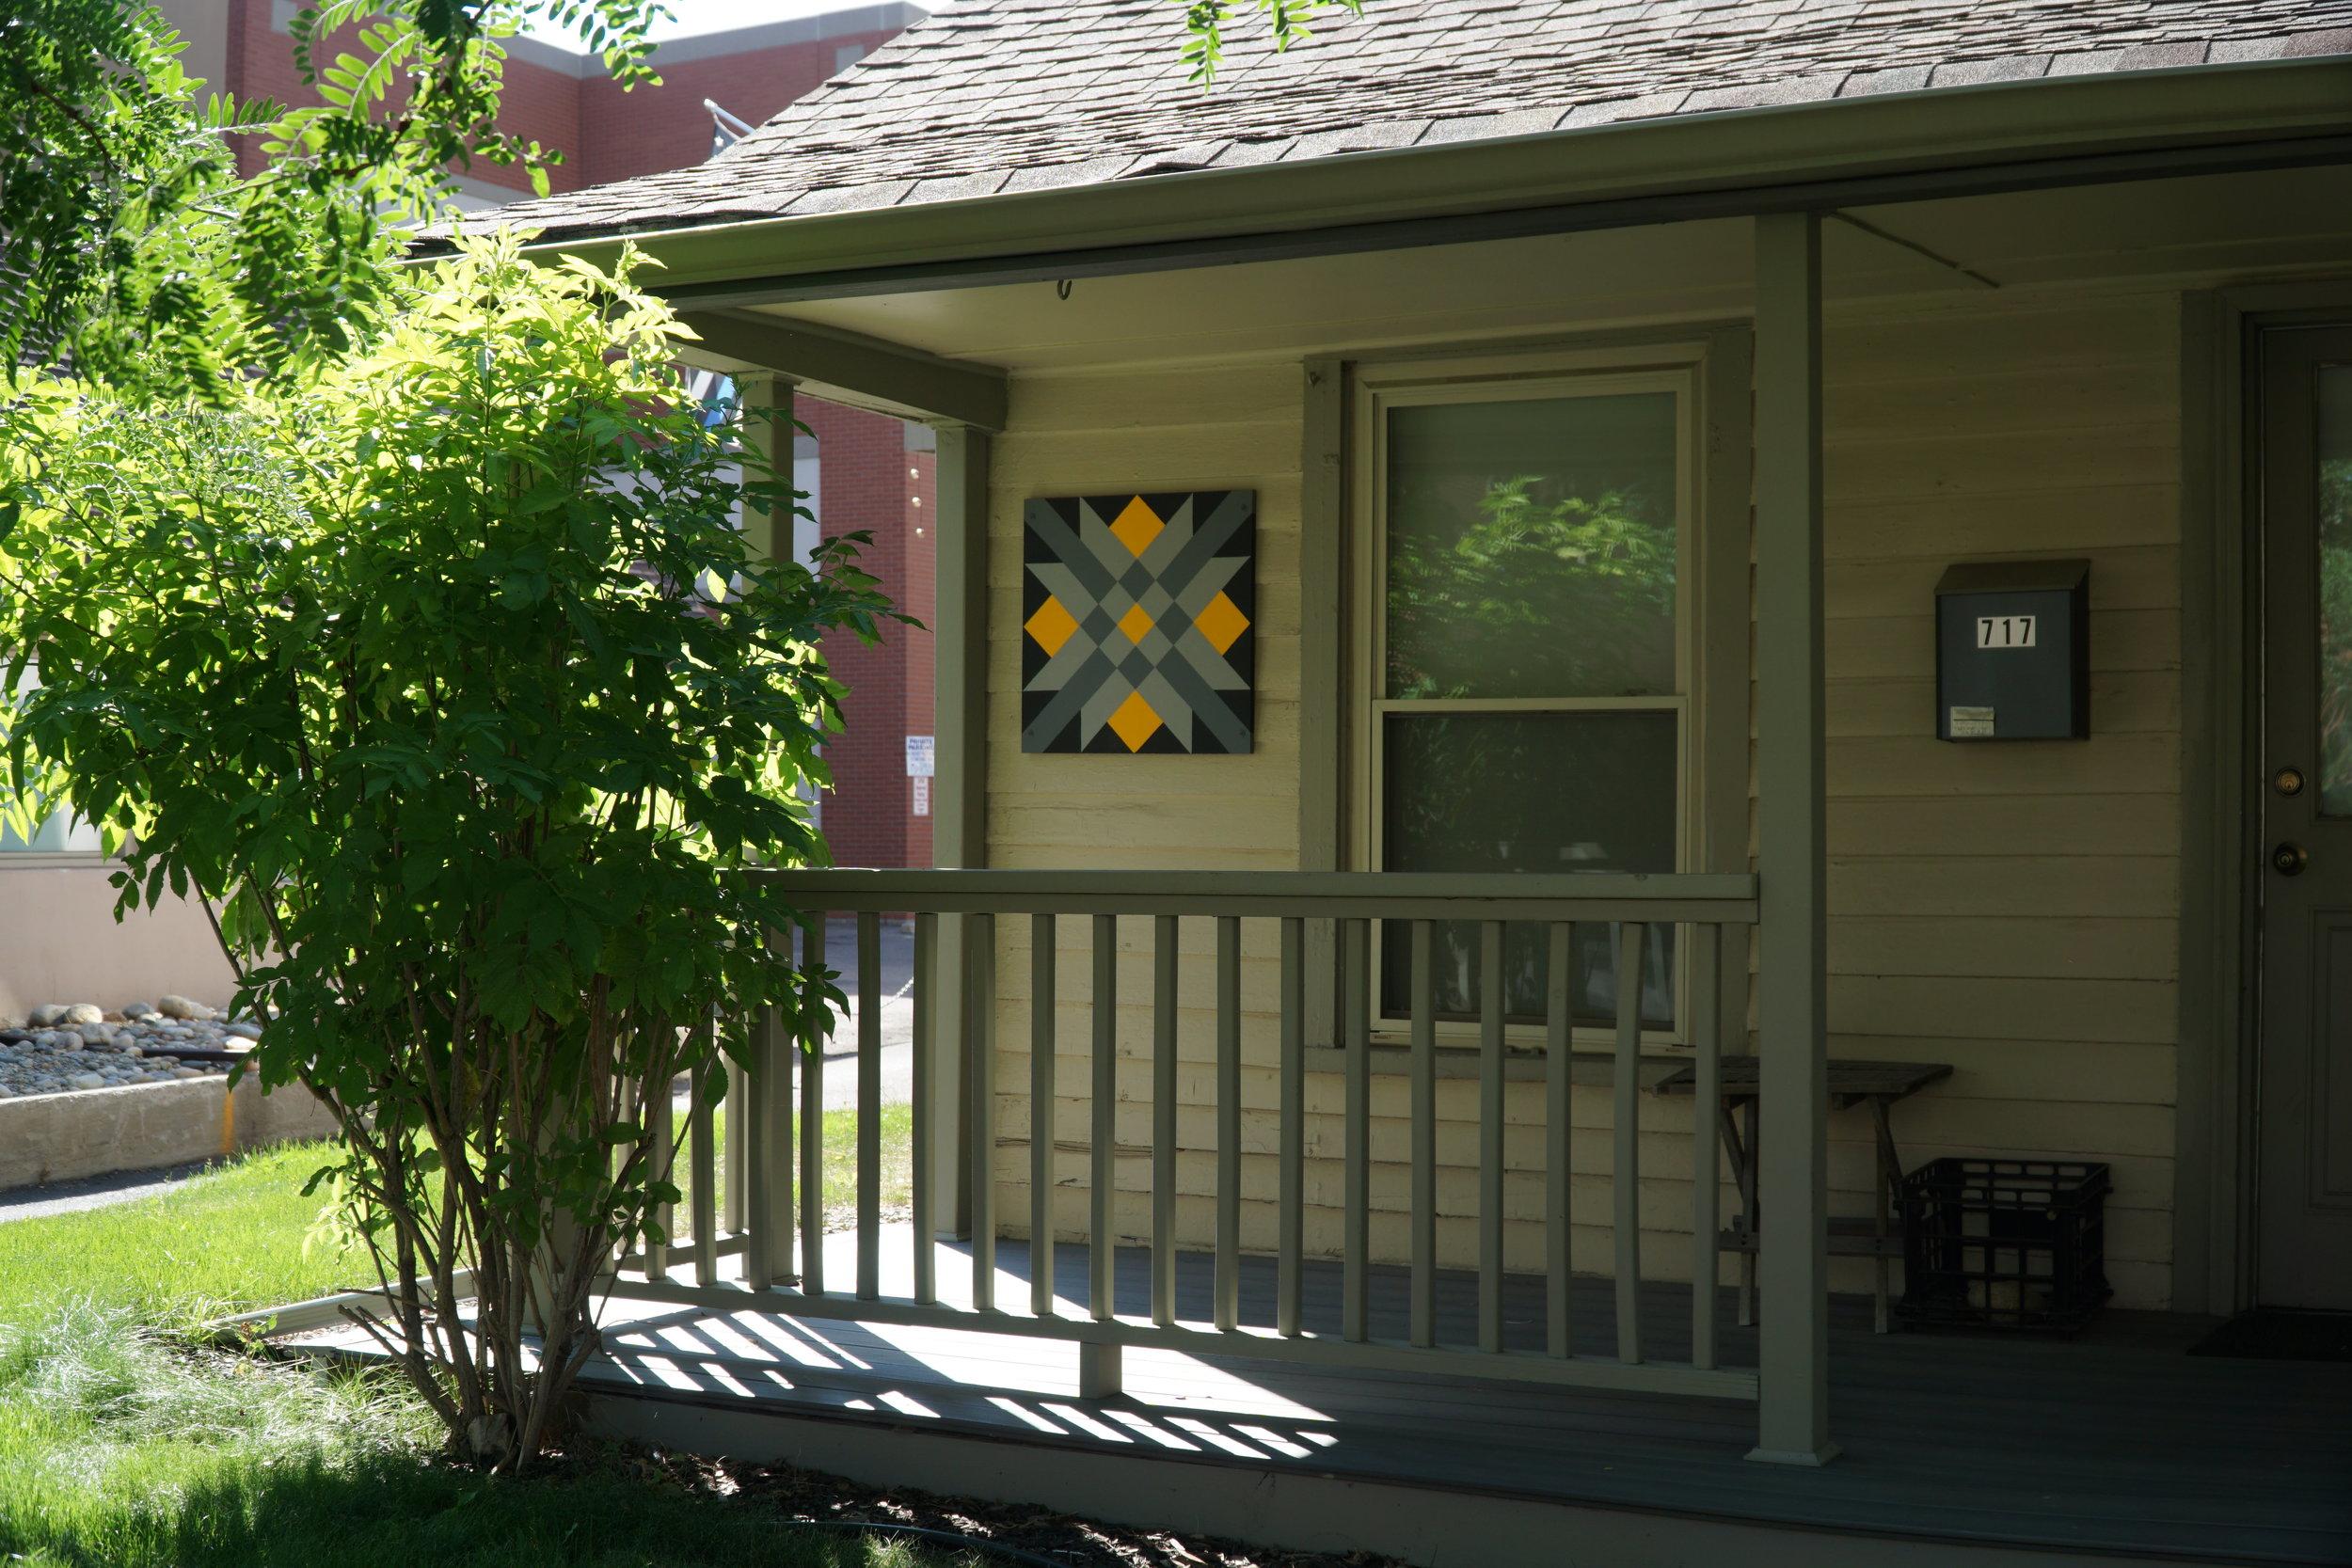 20170727 - Golden-Downtown-Historic-Home.JPG